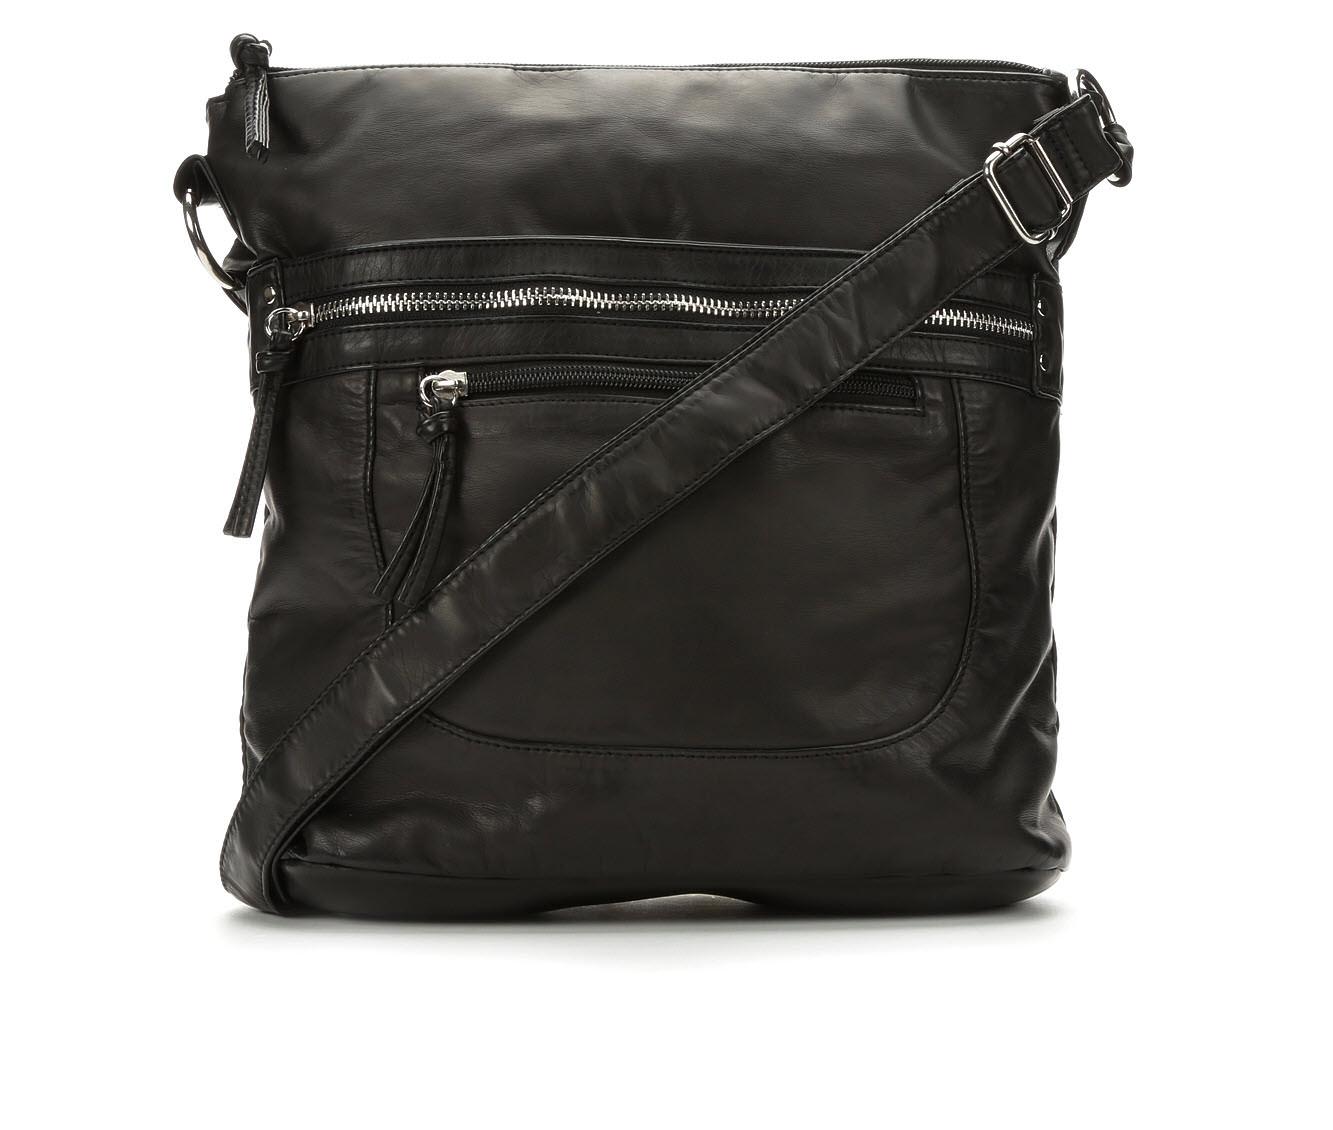 Image of Bueno Of California Washed Crossbody Handbag (Black - Size UNSZ)